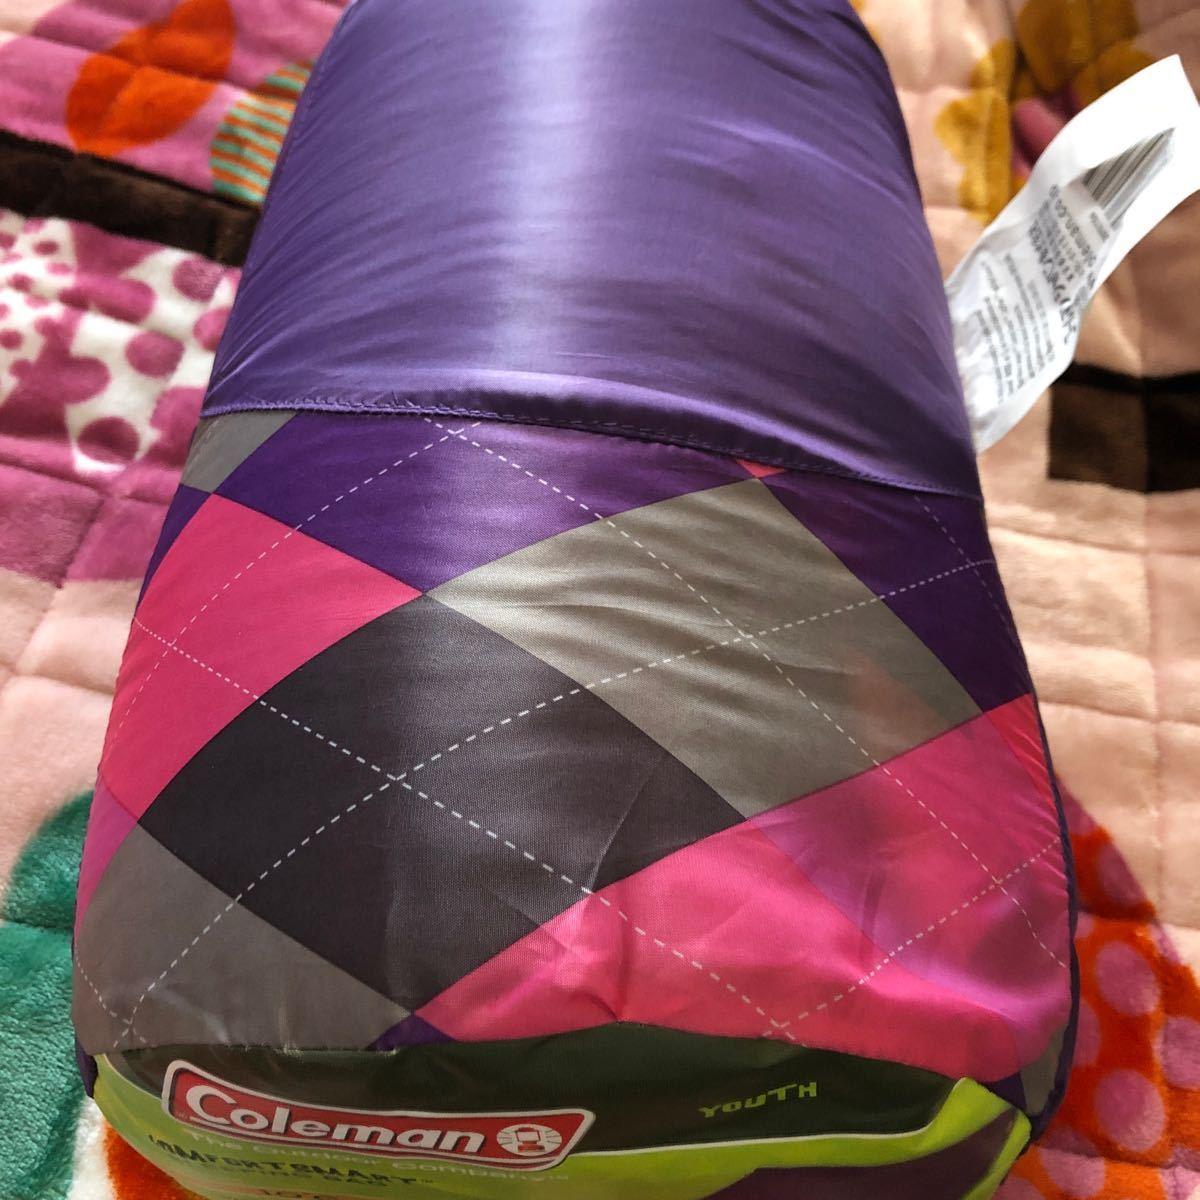 Coleman コールマン 寝袋 子供用